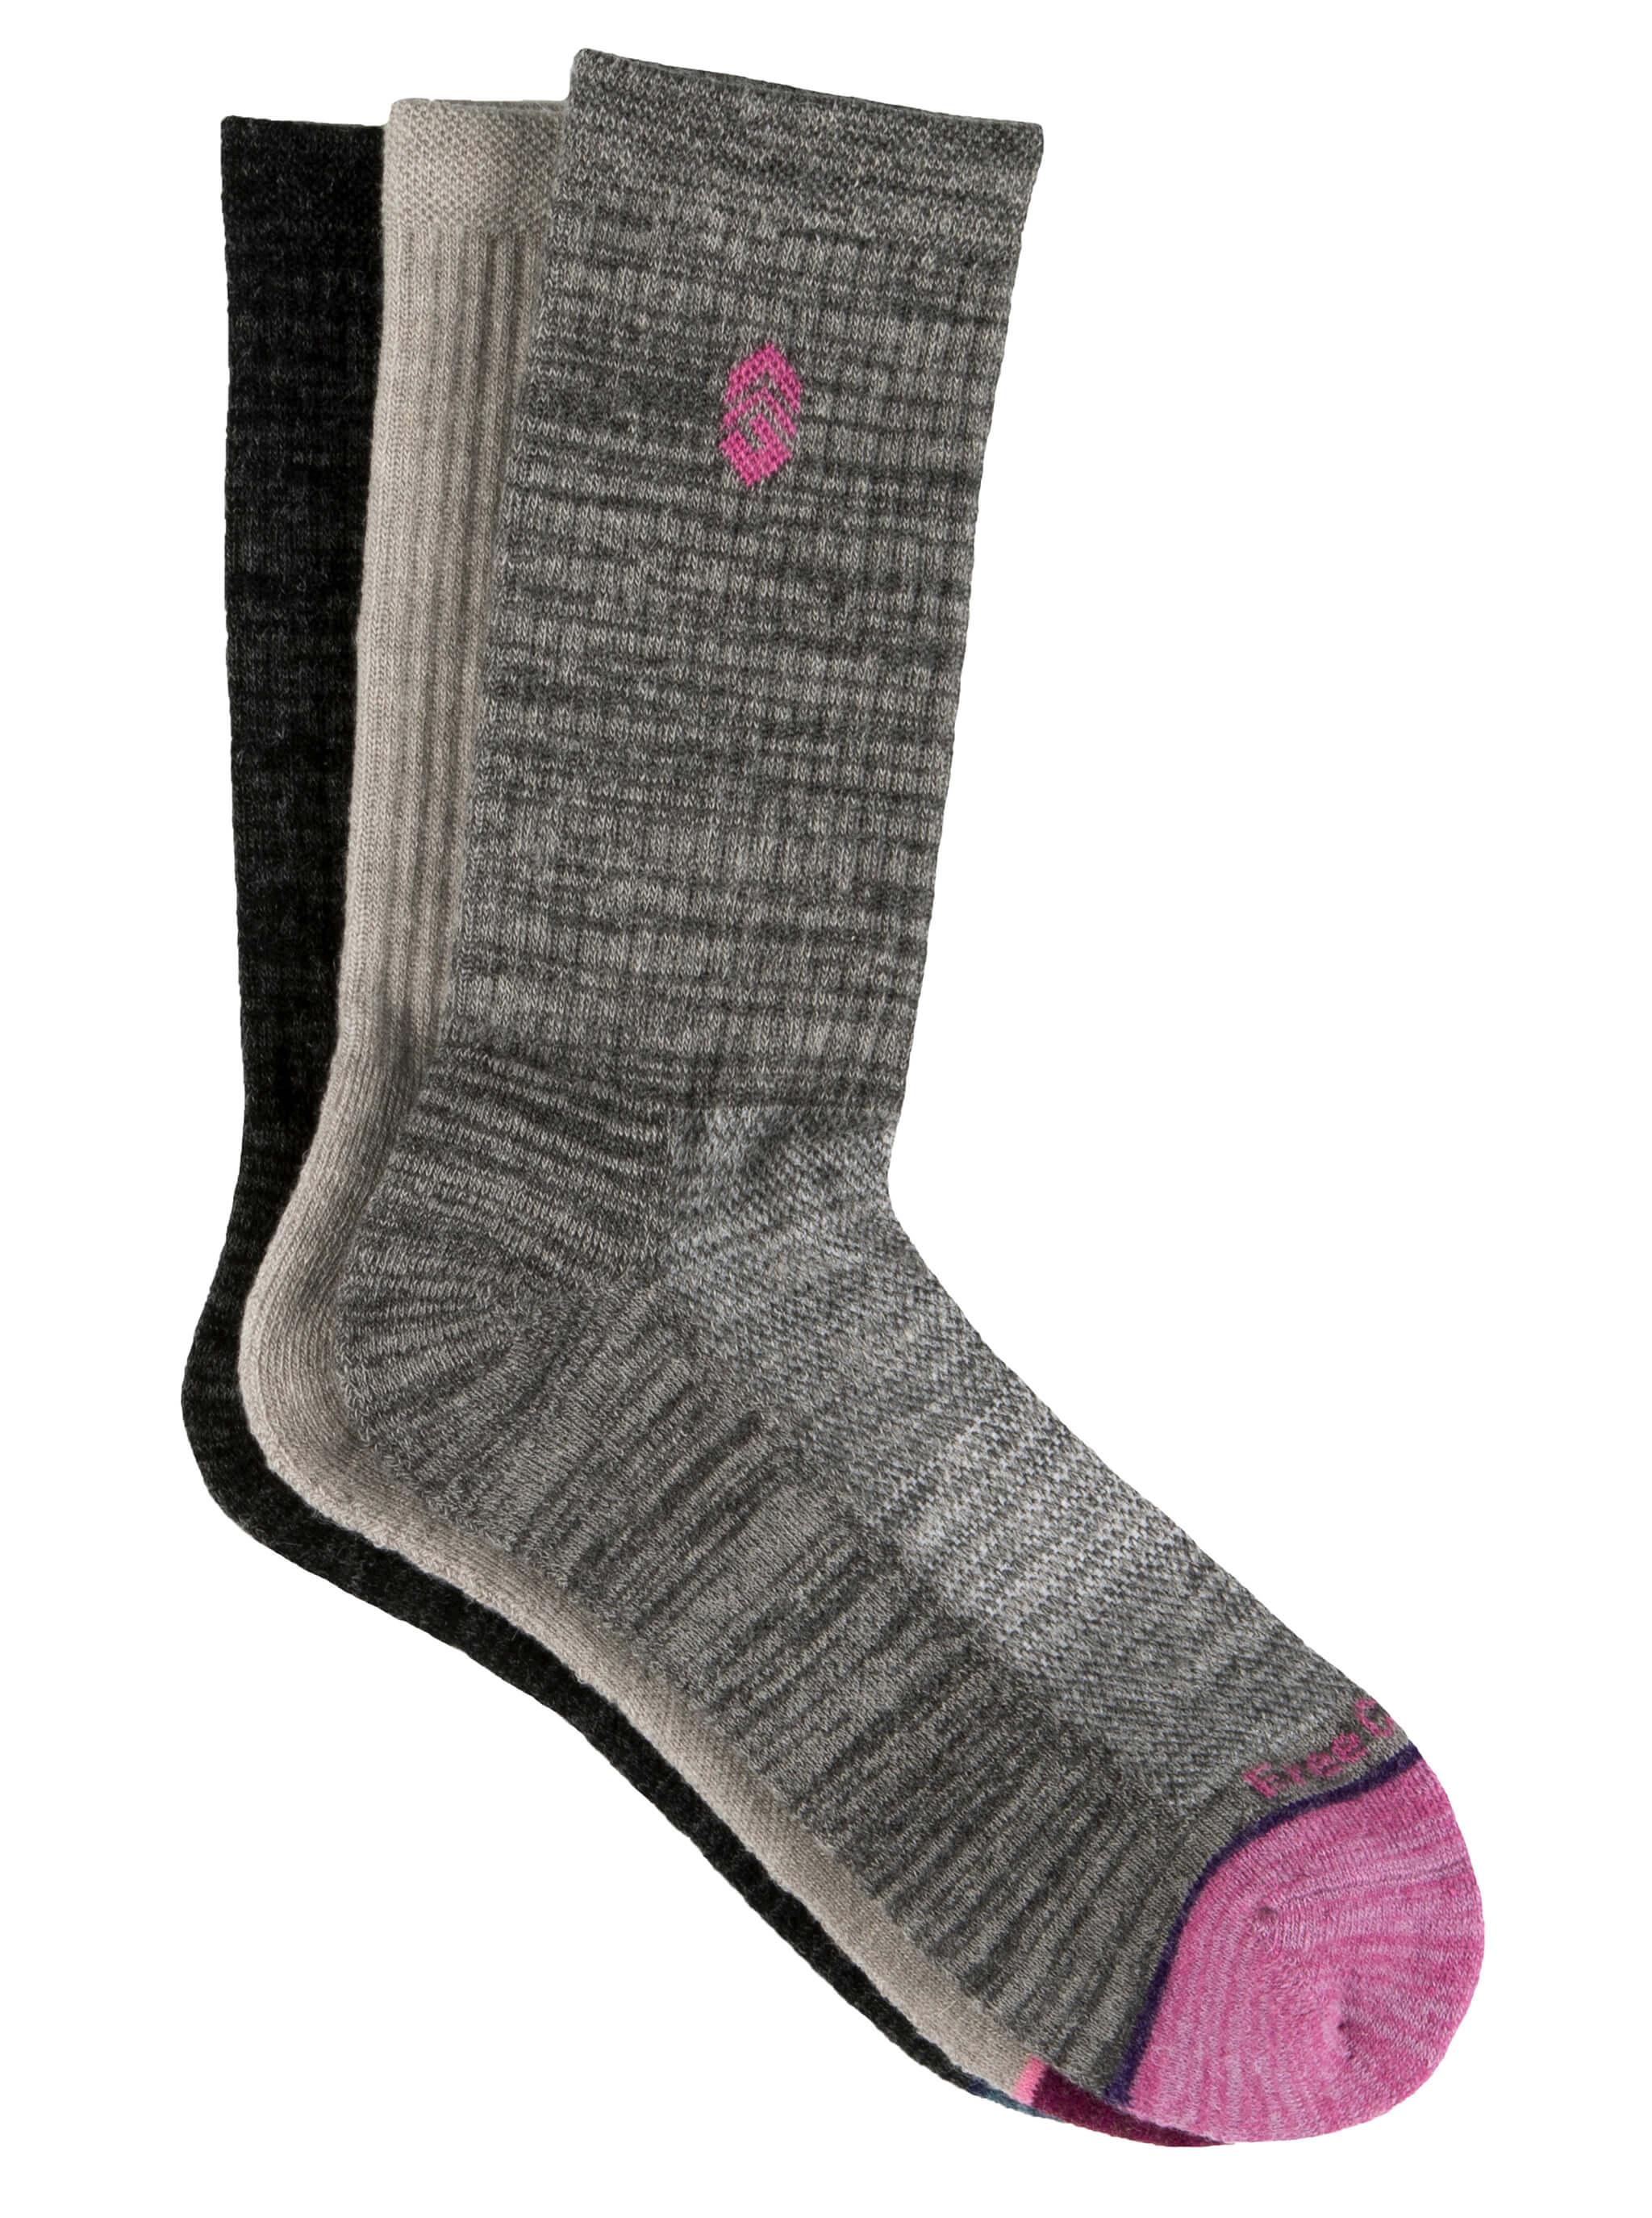 Free Country Women's Wool-Blend Basic Toe Pop Crew Socks - Grey